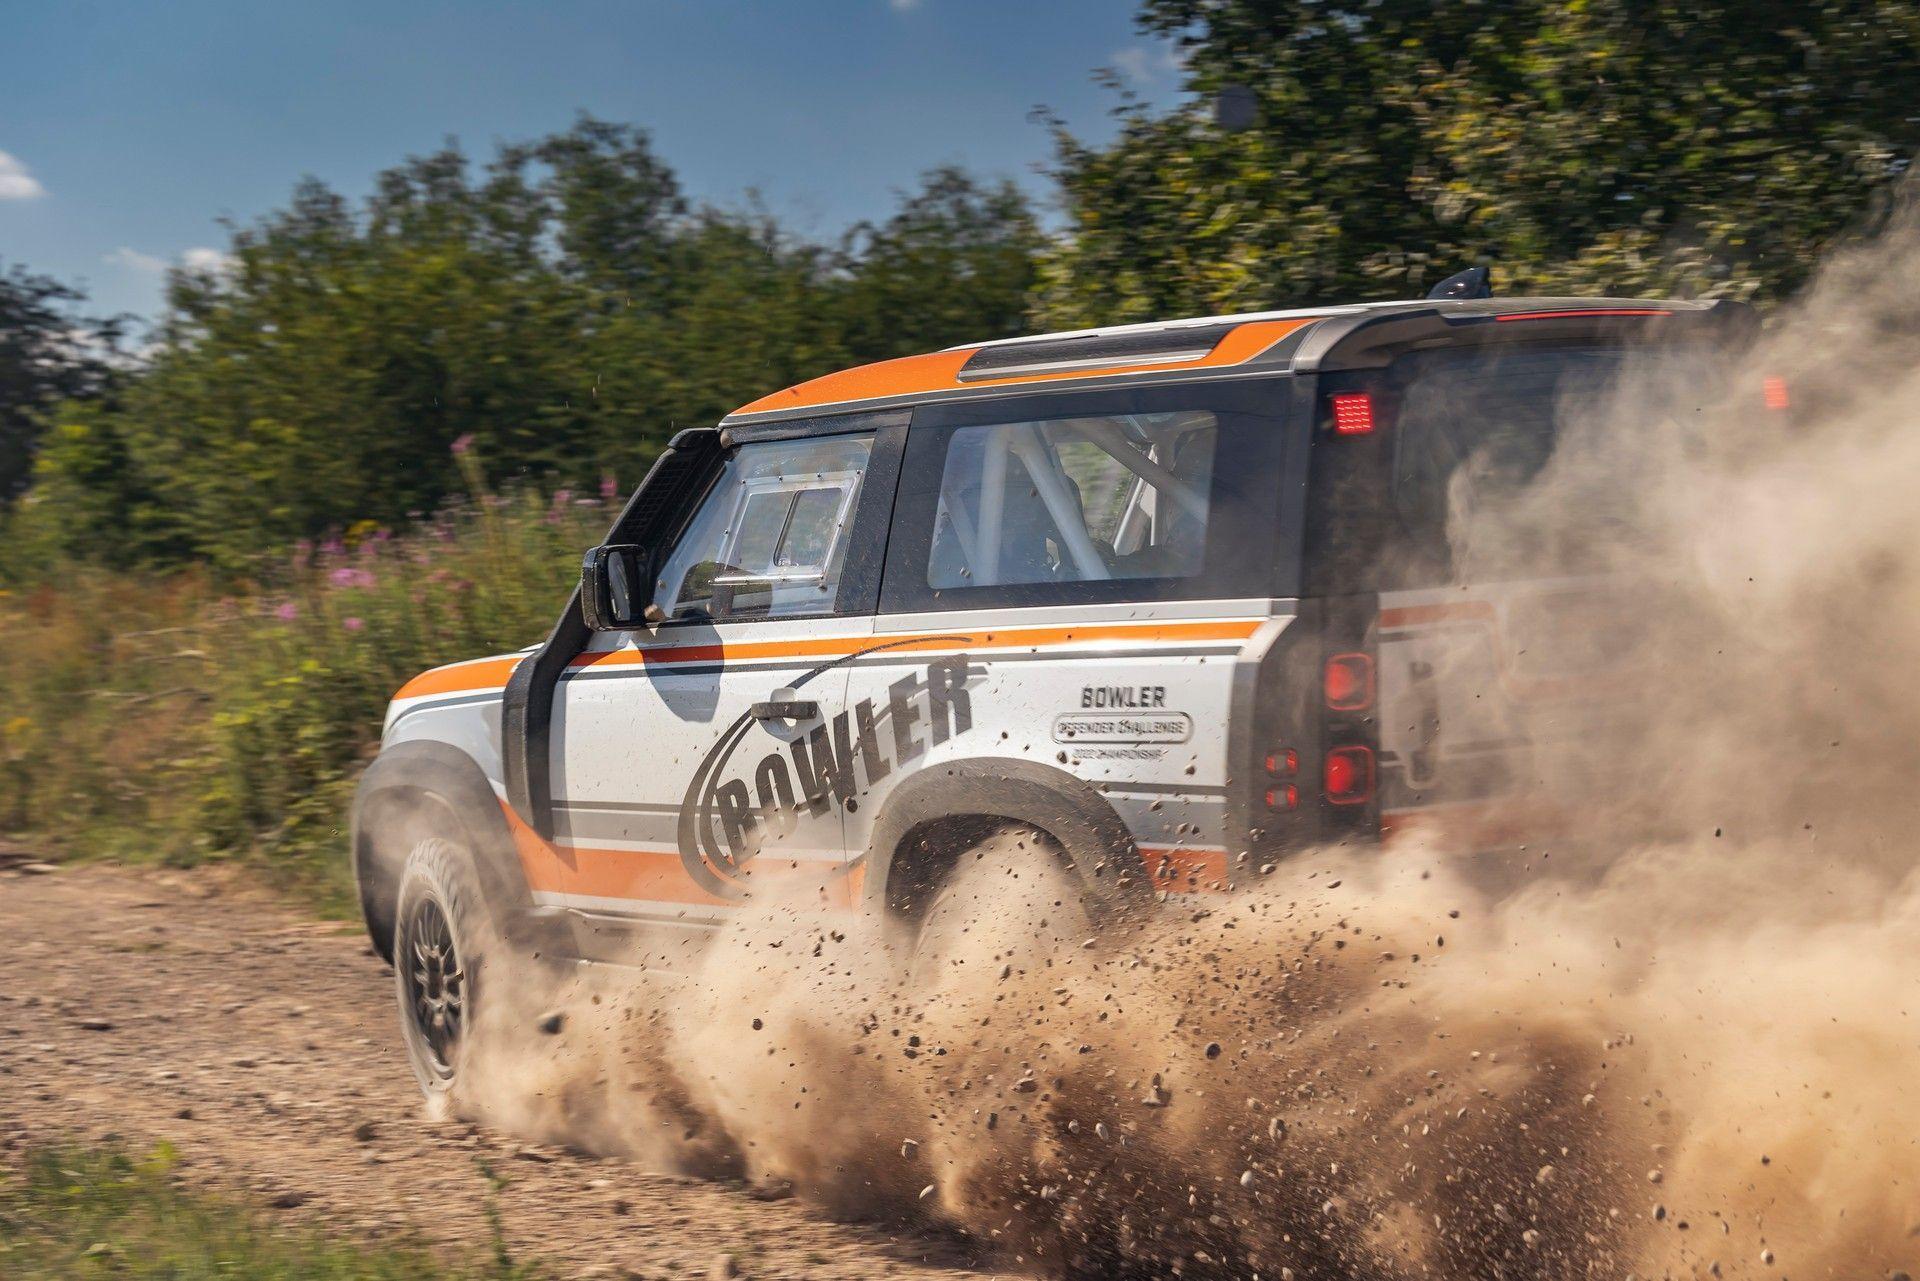 Bowler-Land-Rover-Defender-Challenge-Rally-Car-22